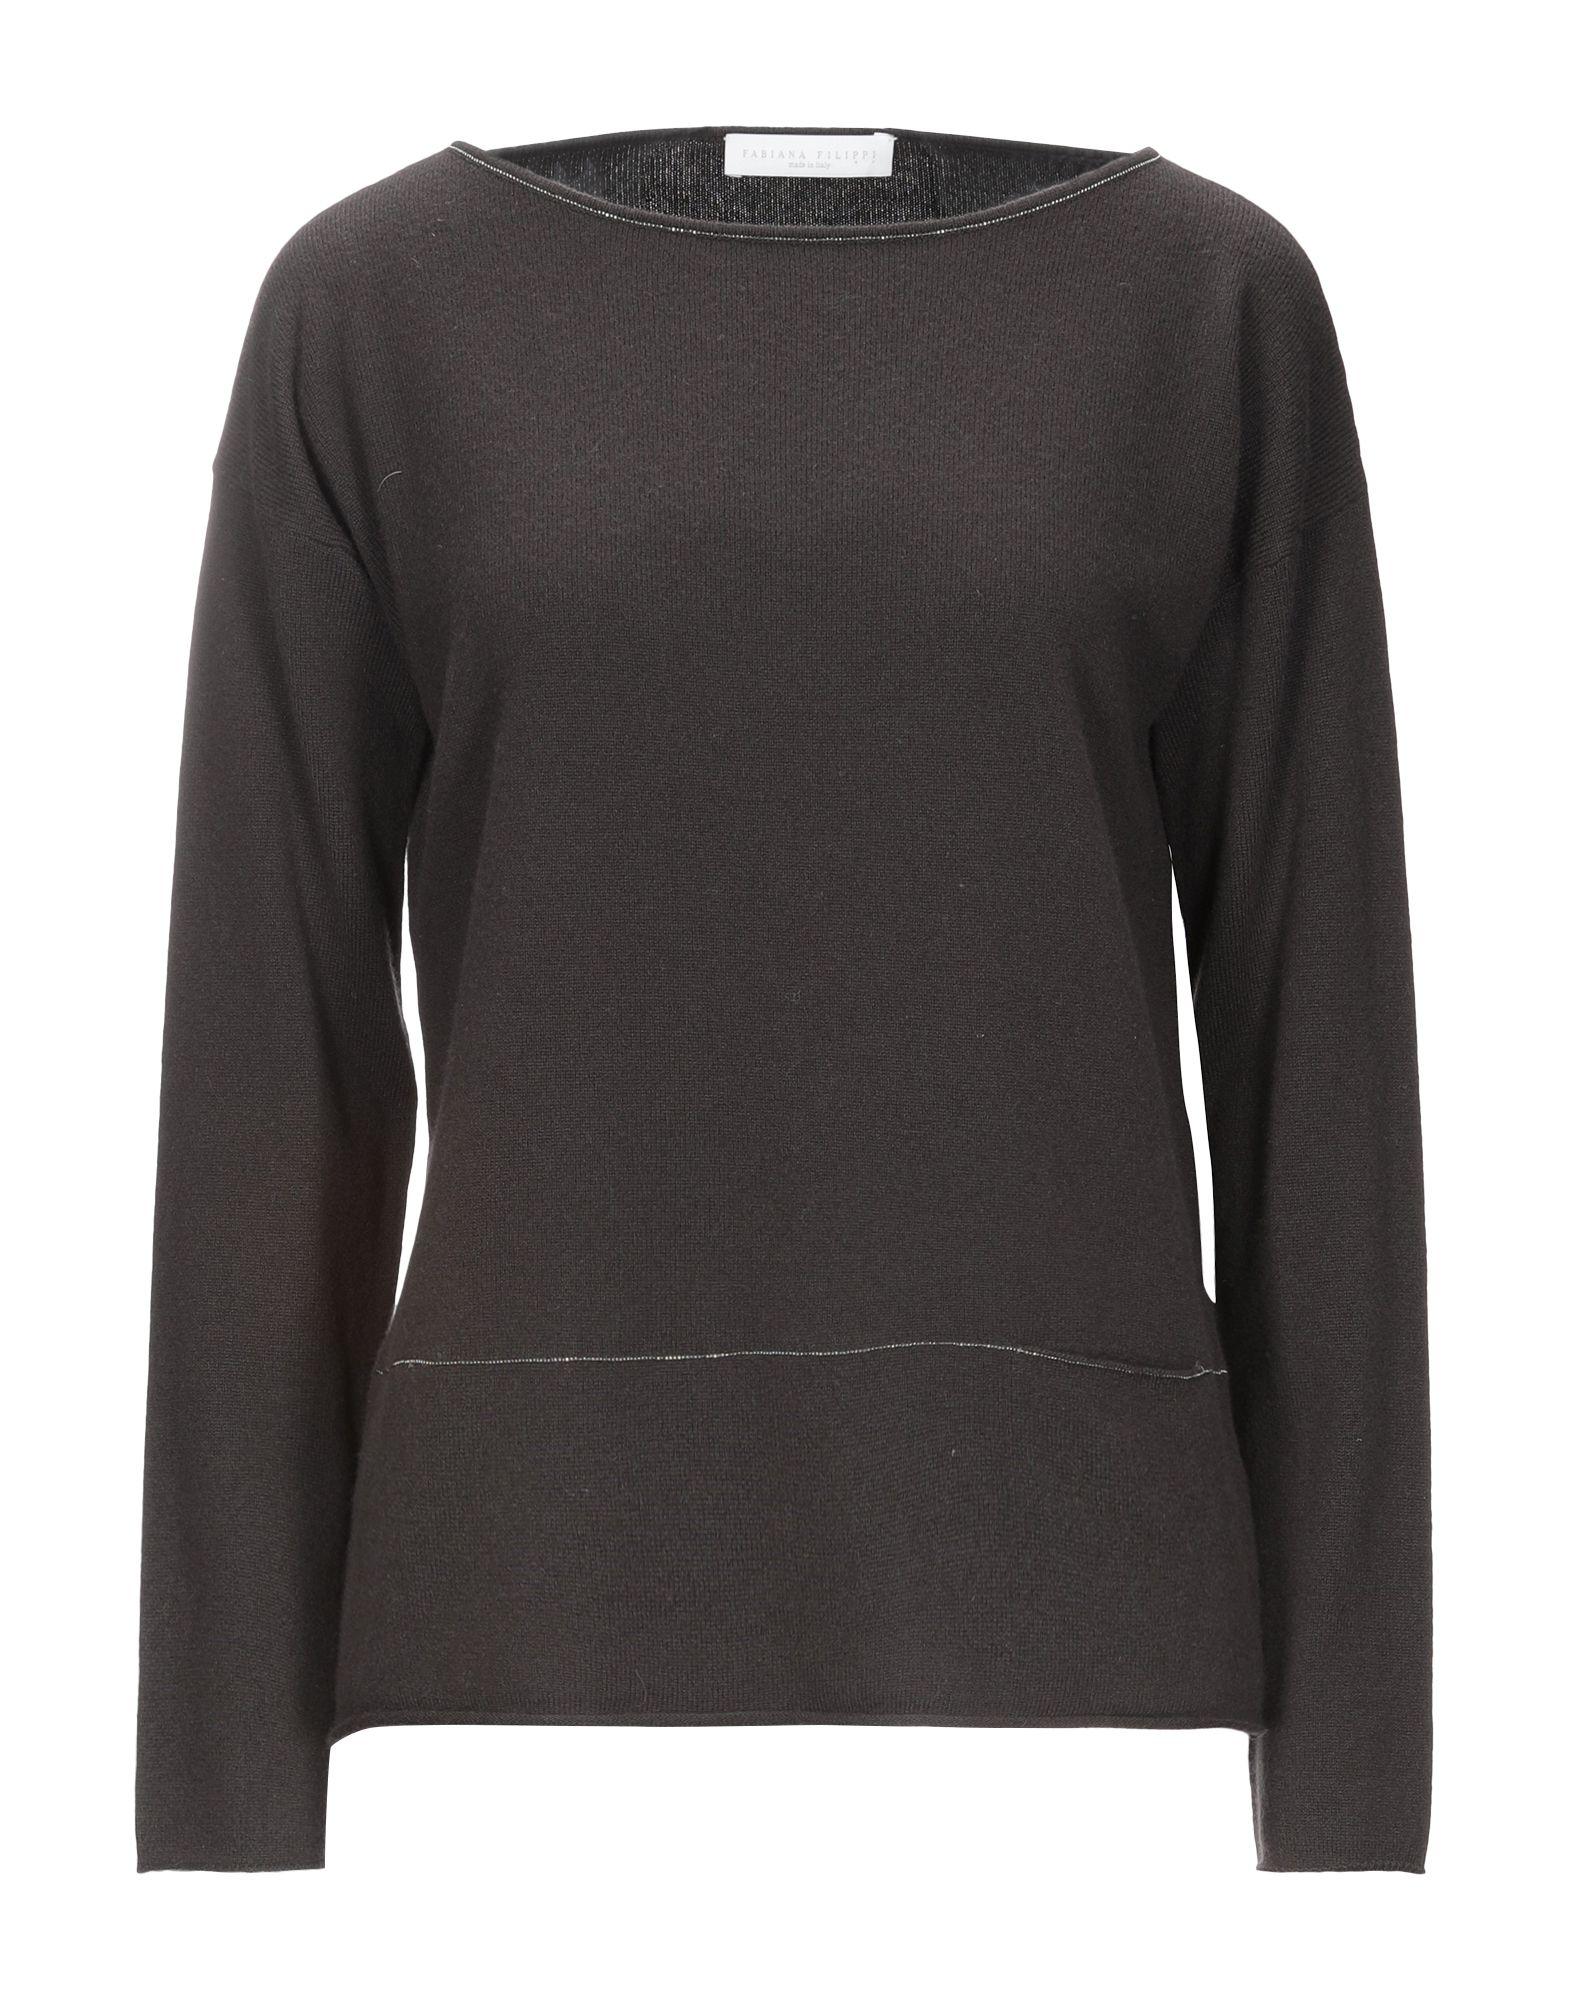 FABIANA FILIPPI Sweaters - Item 39992895